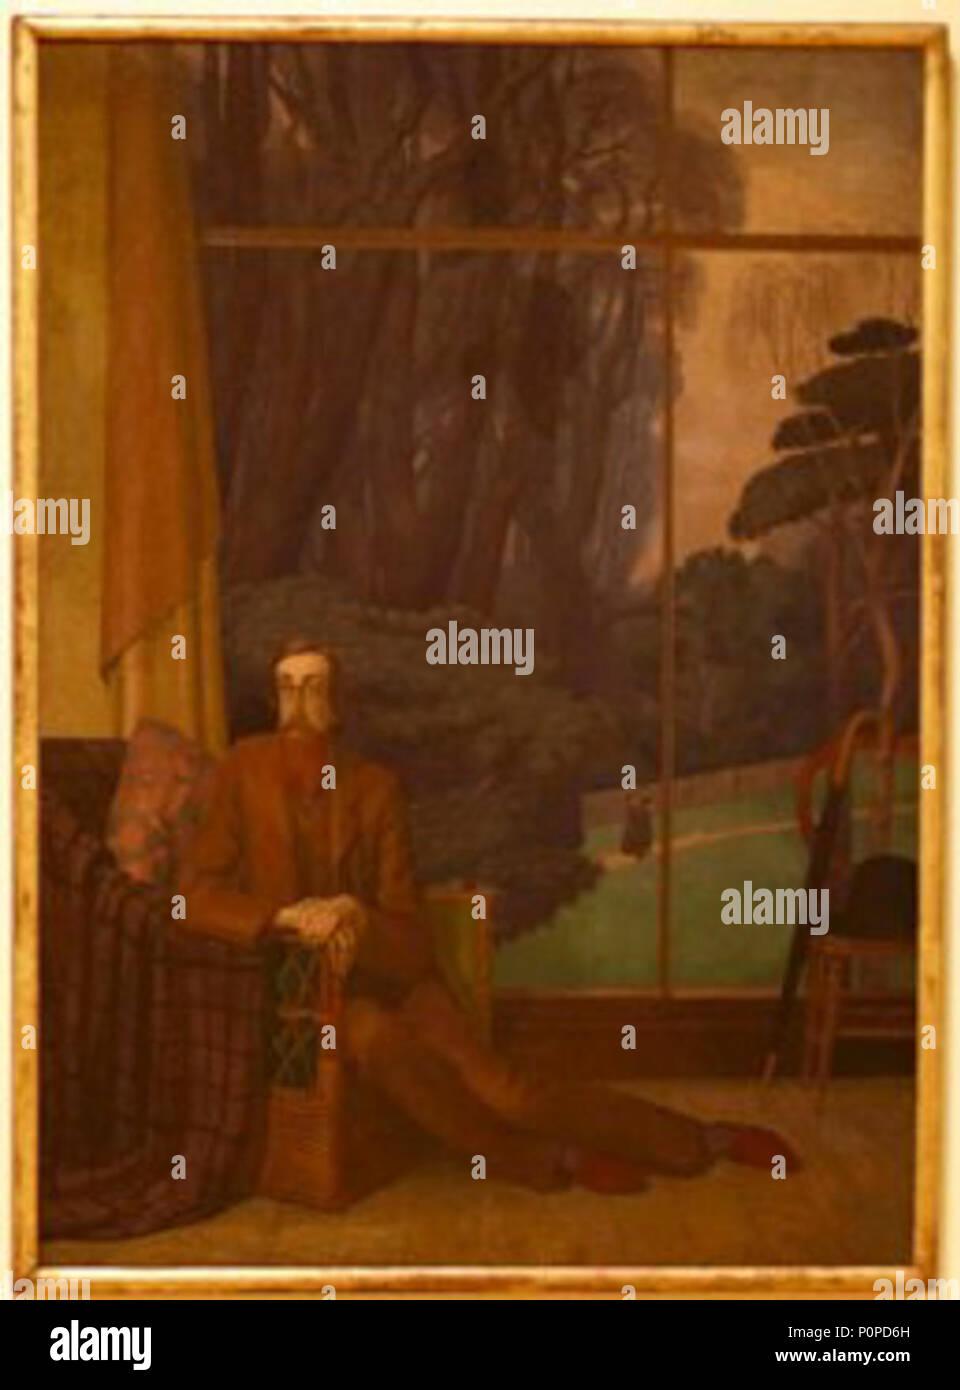 Lytton Strachey 28191429 par Lytton Strachey. Banque D'Images